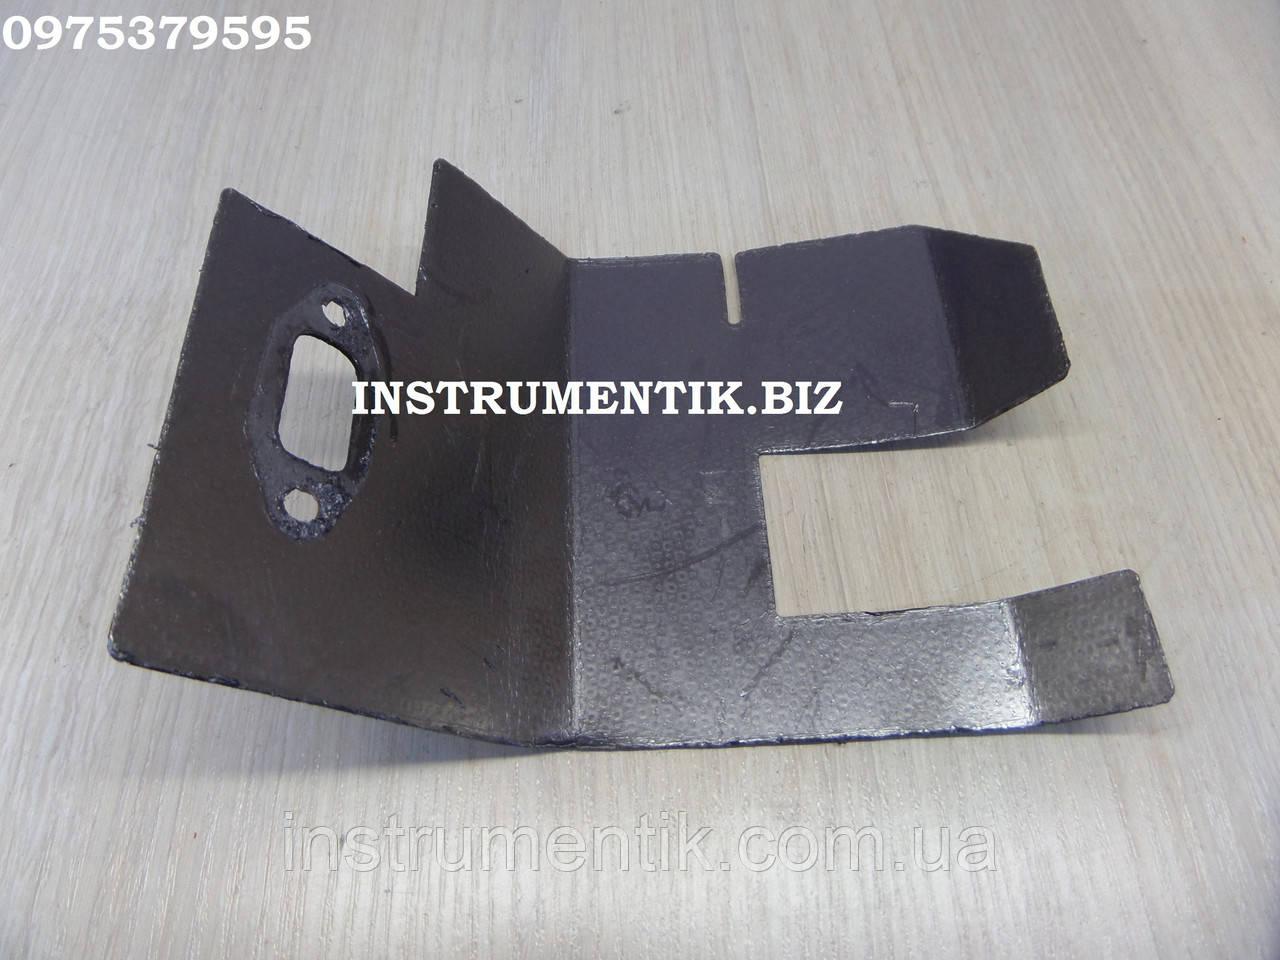 Прокладка глушителя для AgriMotor 3W-650